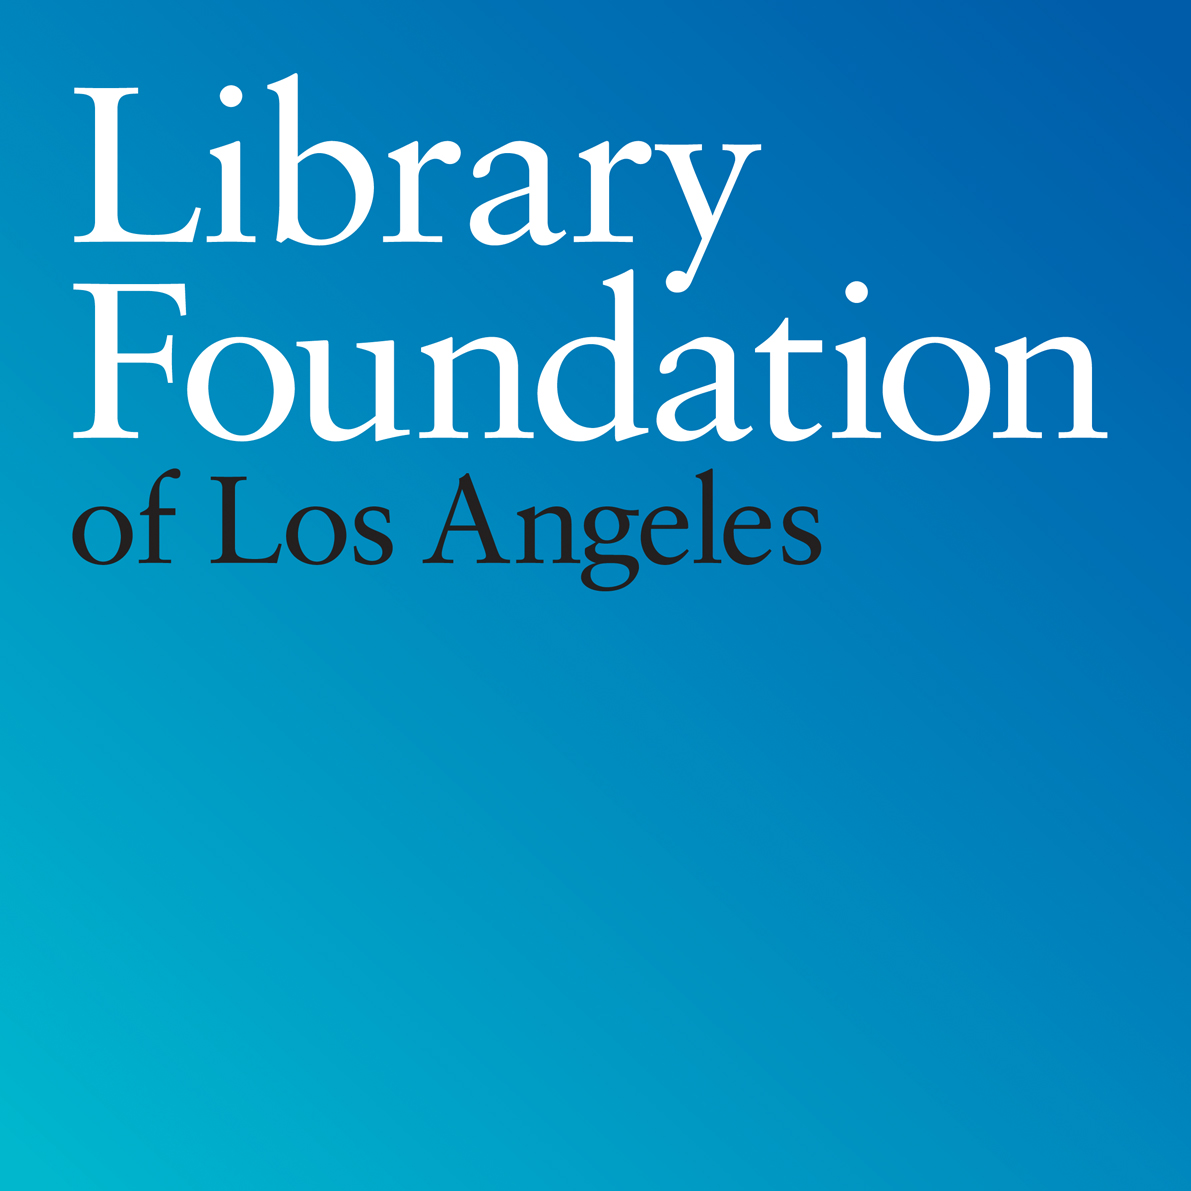 LFLA_Logo_Sabon_300.jpg